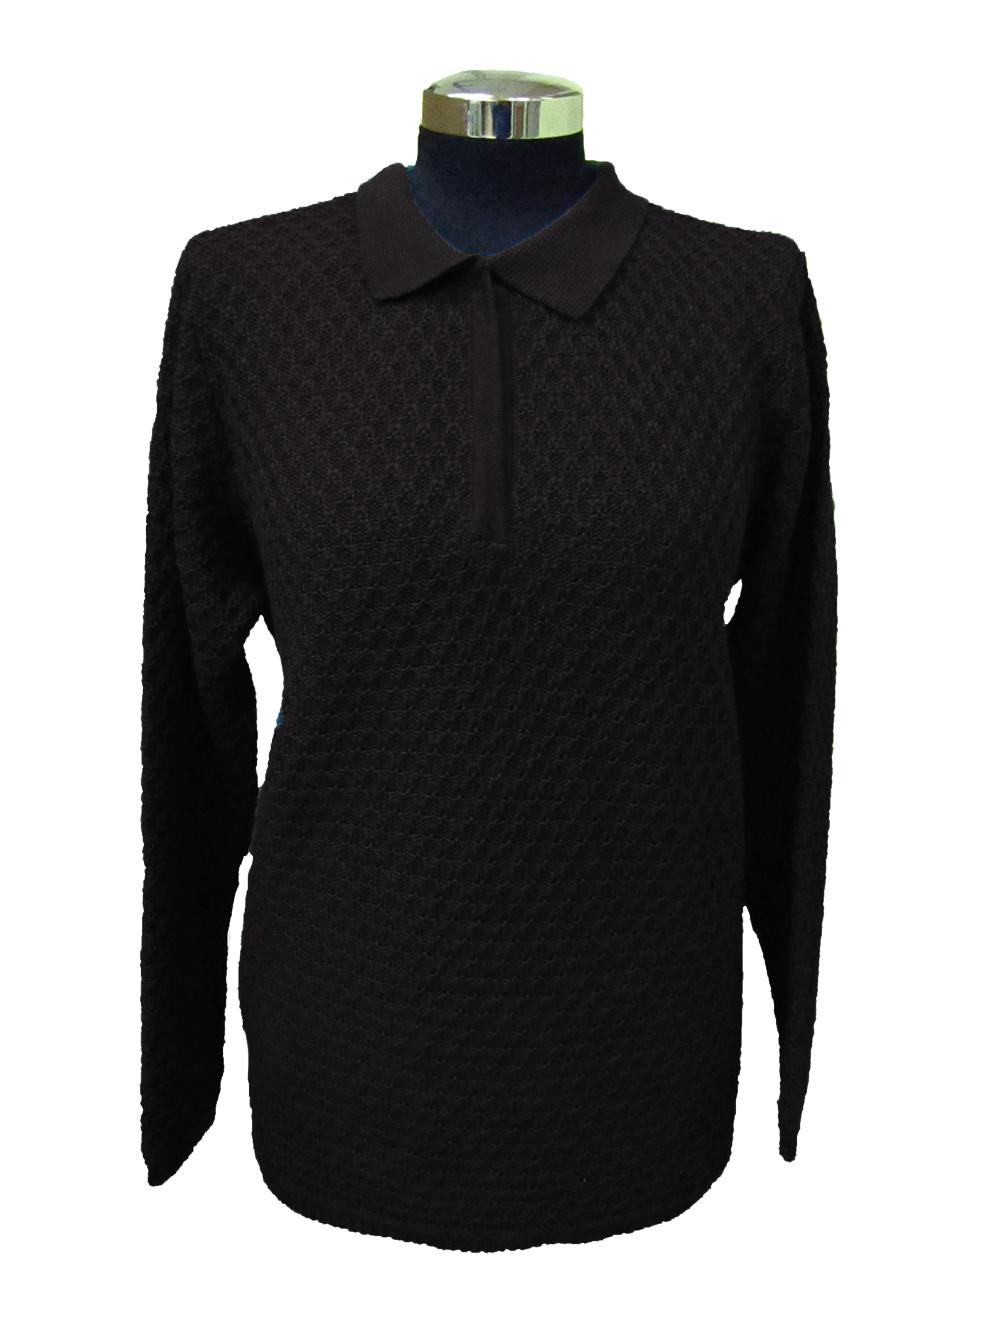 Polo Sweater in Bubble Knitwork - Black